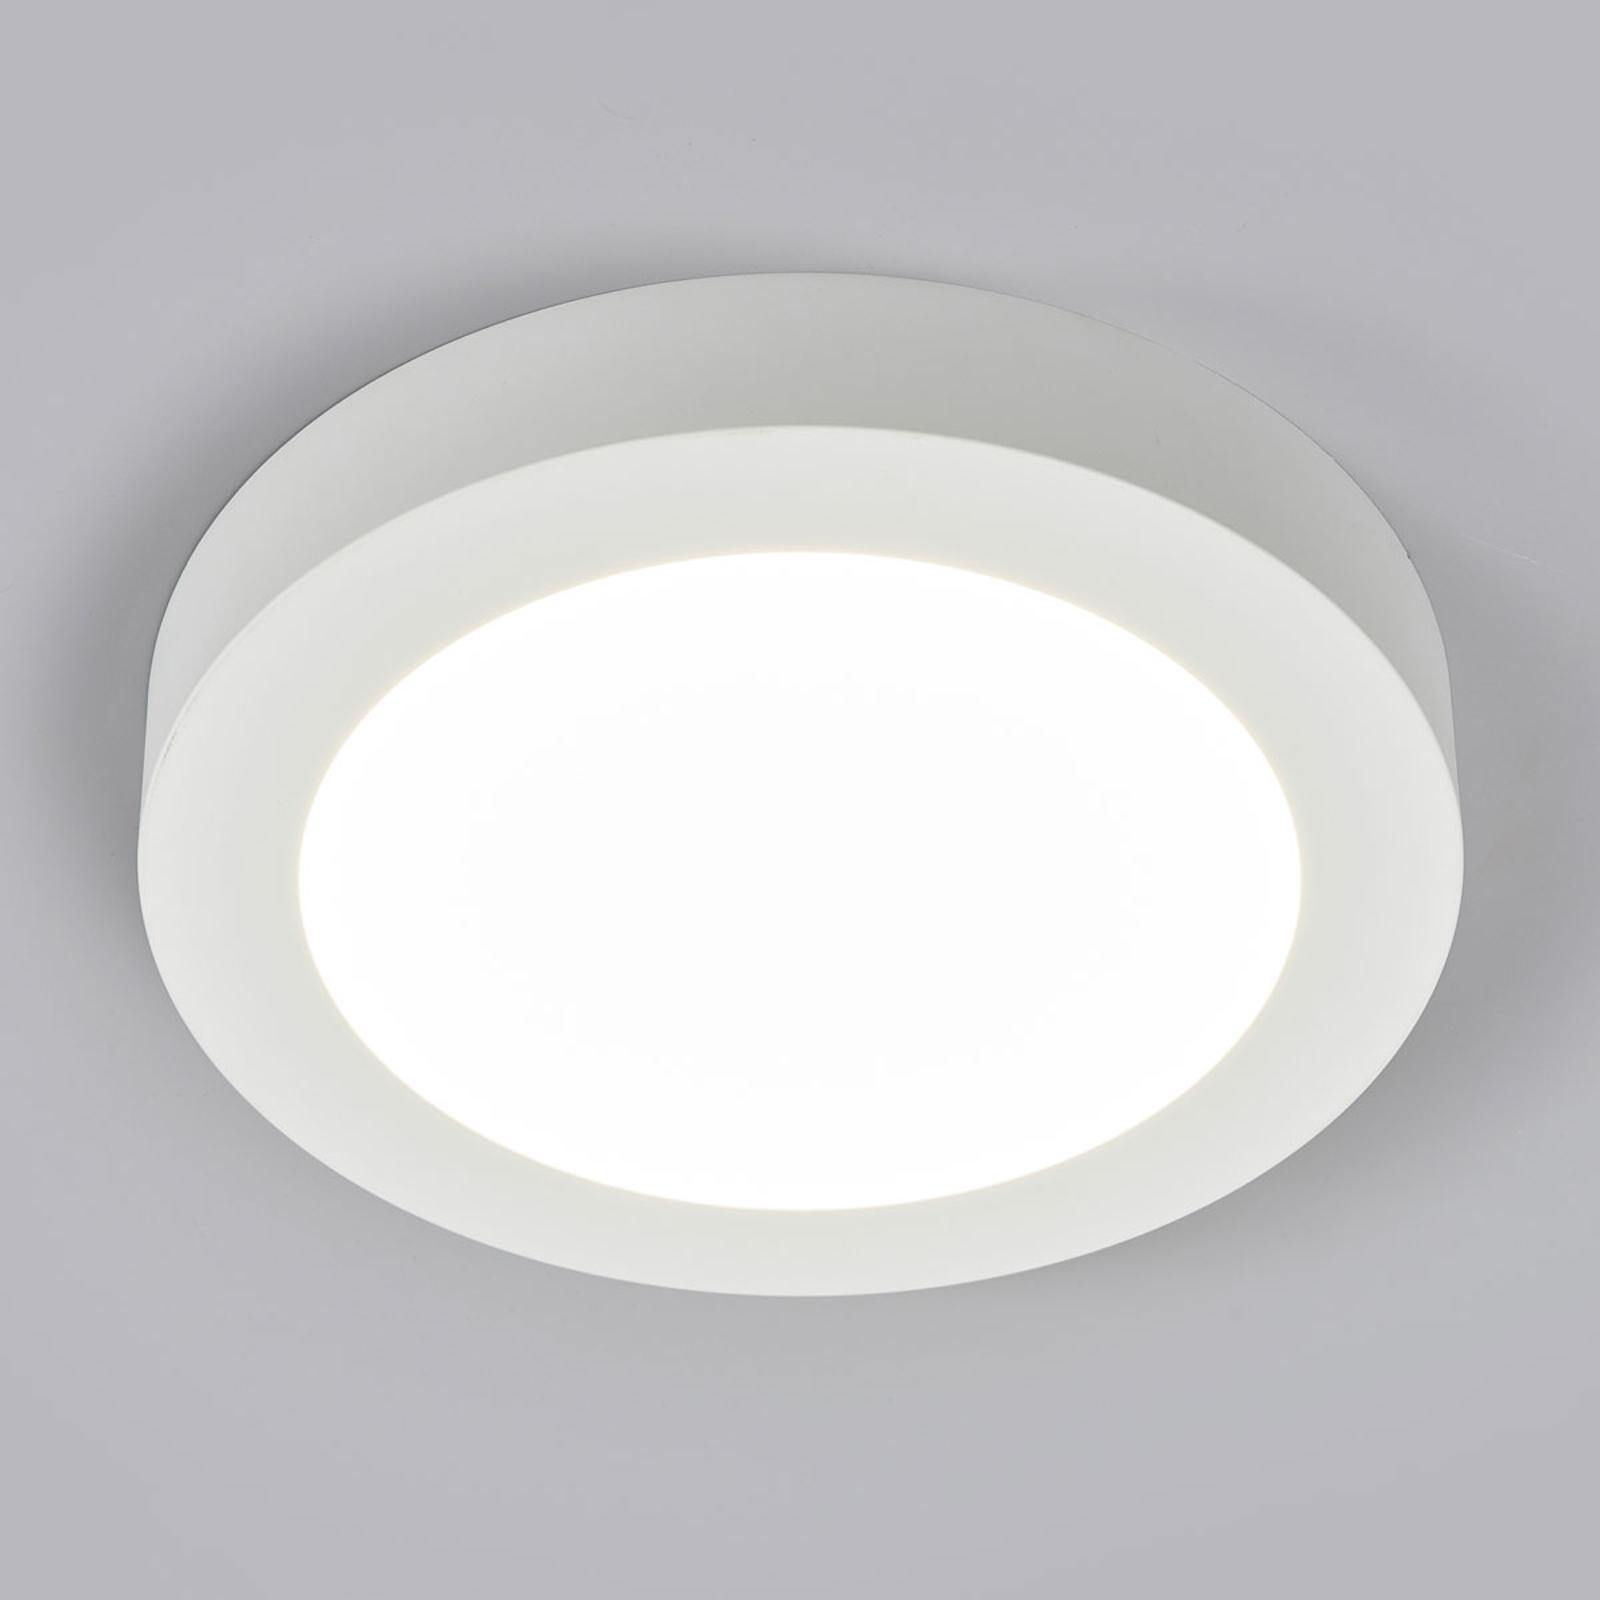 LED plafondlamp Marlo wit 4.000K rond 25,2 cm